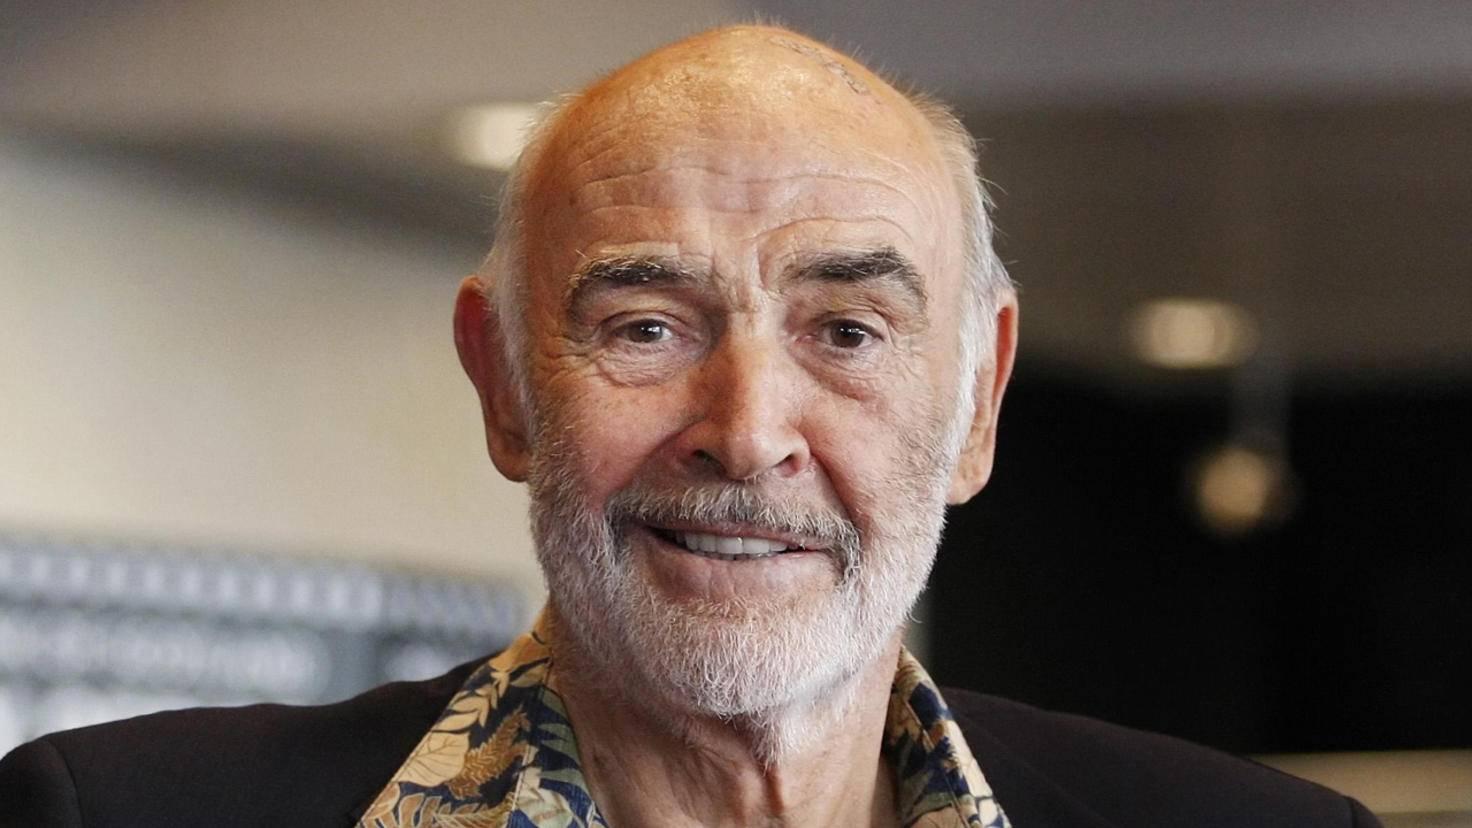 Auch Sean Connery vermisst das Filmgeschäft offenbar nicht.